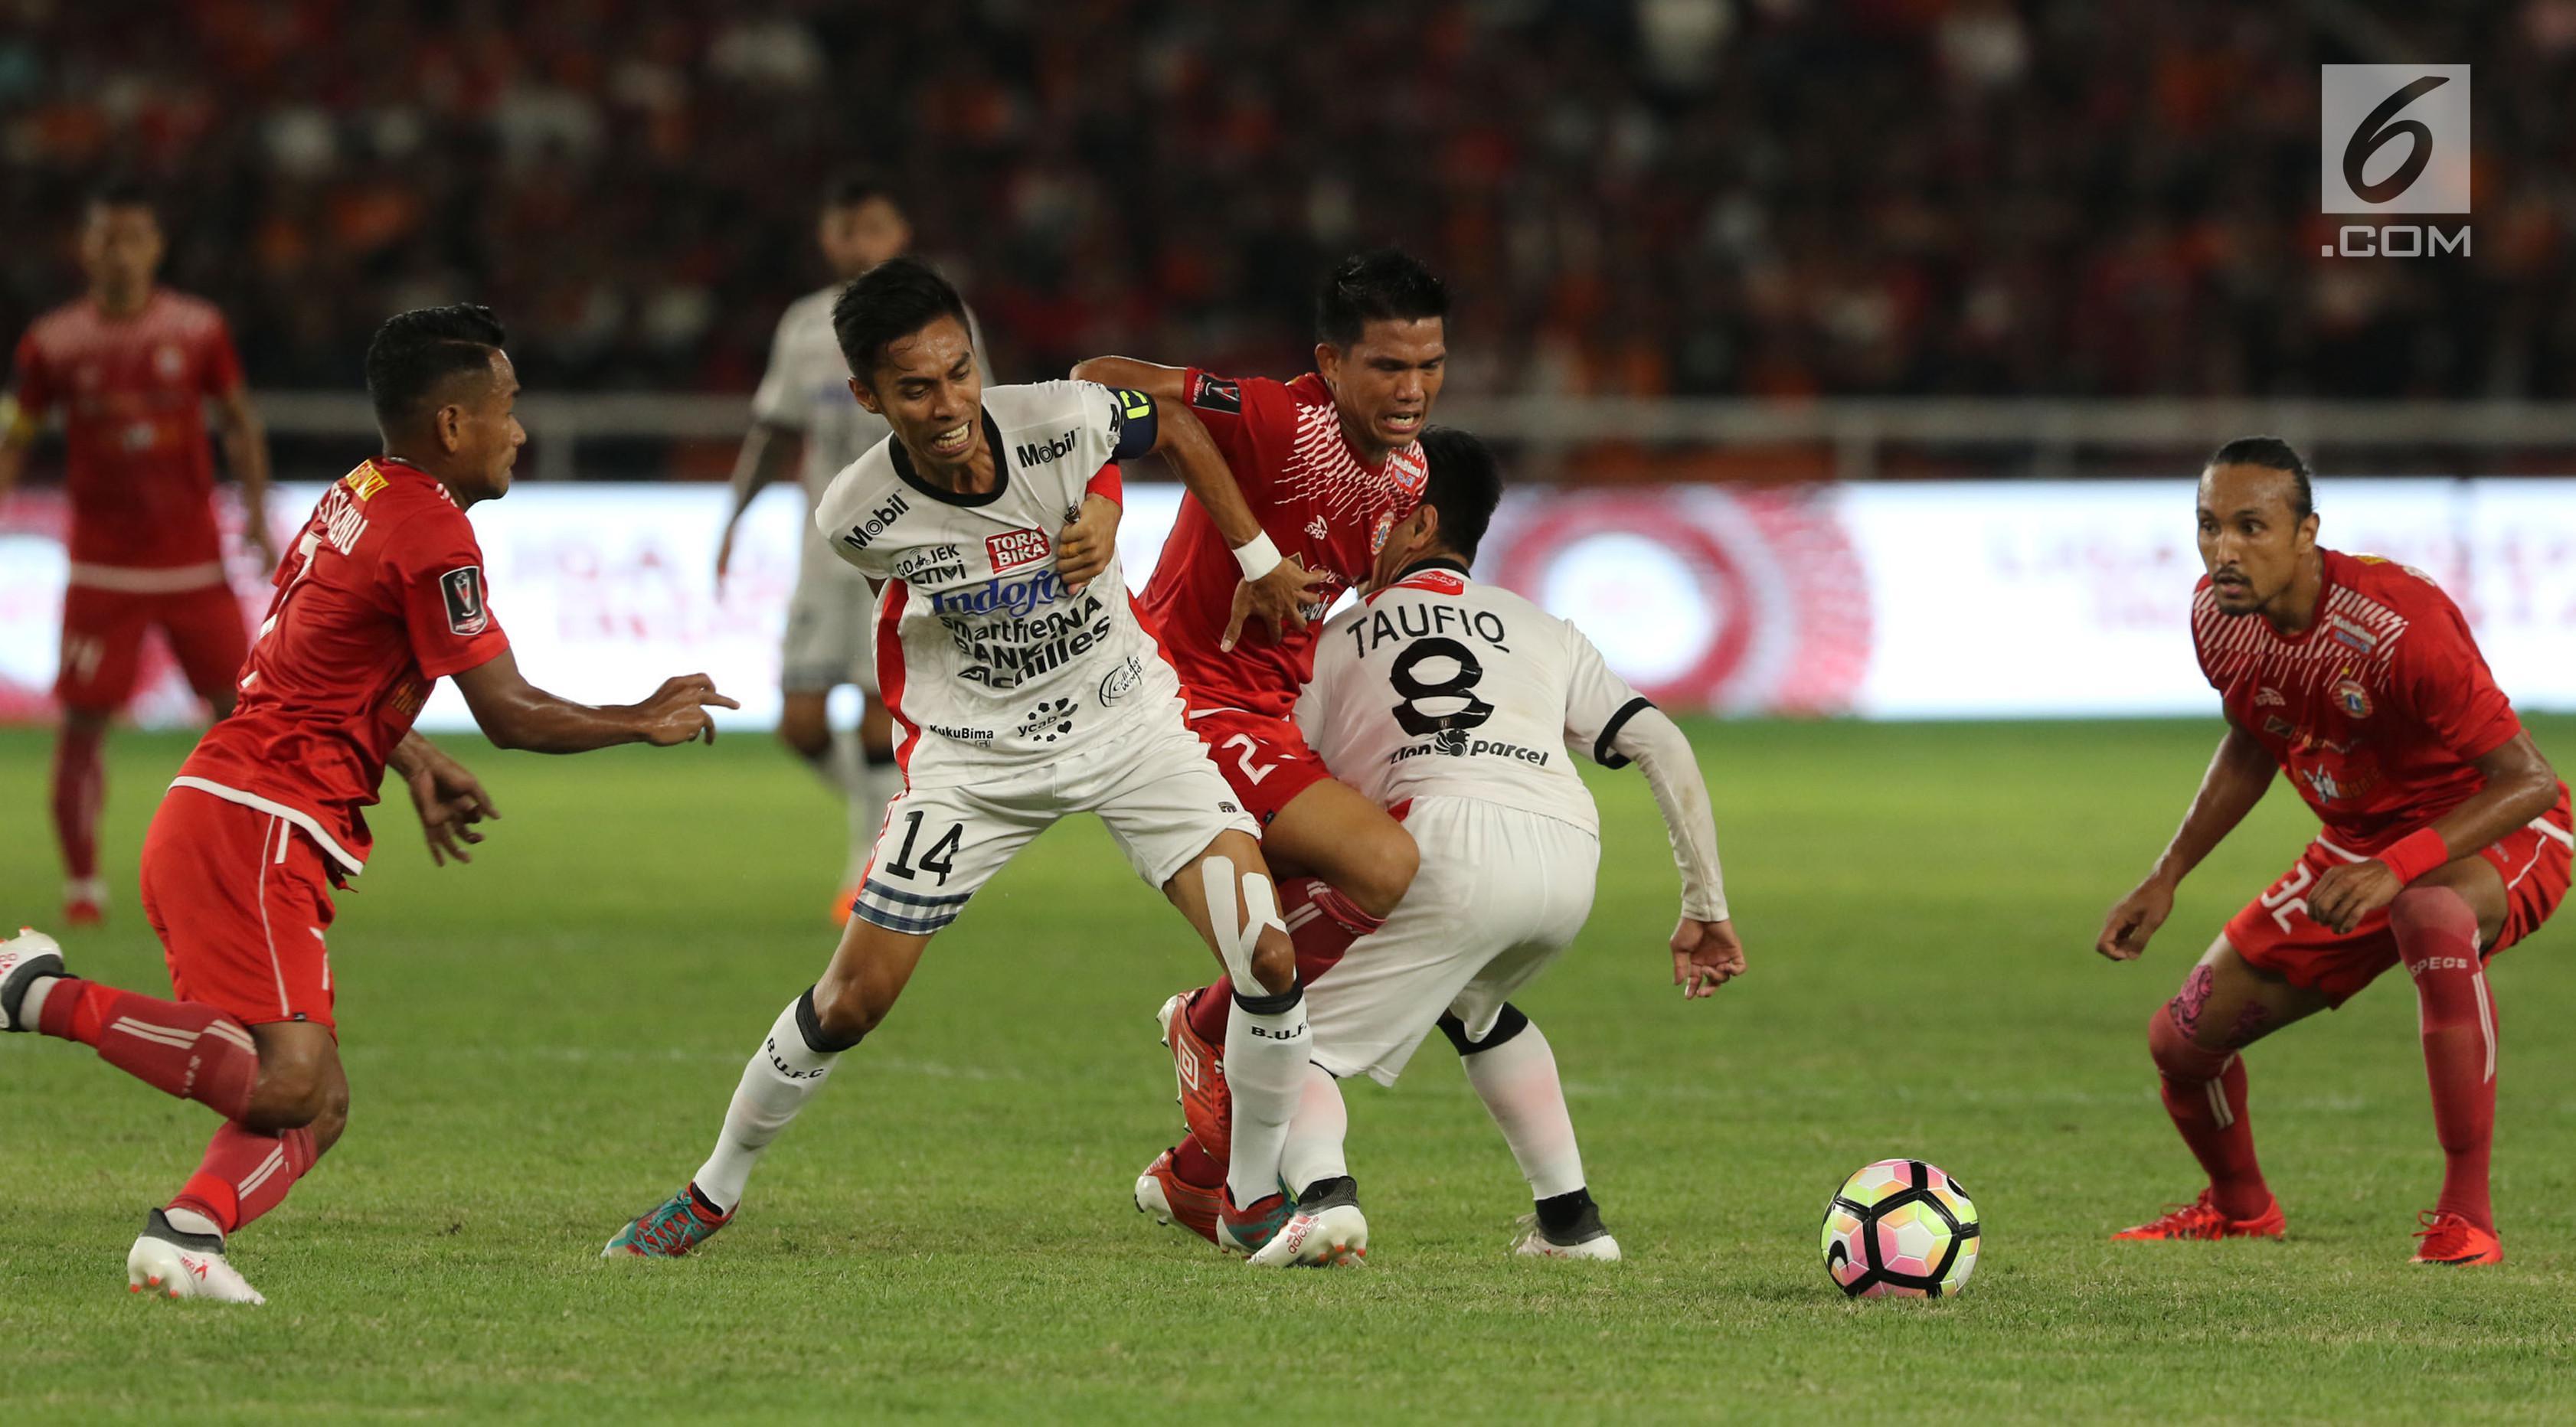 Pemain Bali United membawa bola yang dibayang-bayangi pemain Persija Jakarta pada final Piala Presiden di Stadion Utama GBK, Senayan, Jakarta, Sabtu (17/2). Persija Jakarta sementara unggul 2-0 atas Bali United. (Liputan6.com/Arya Manggala)